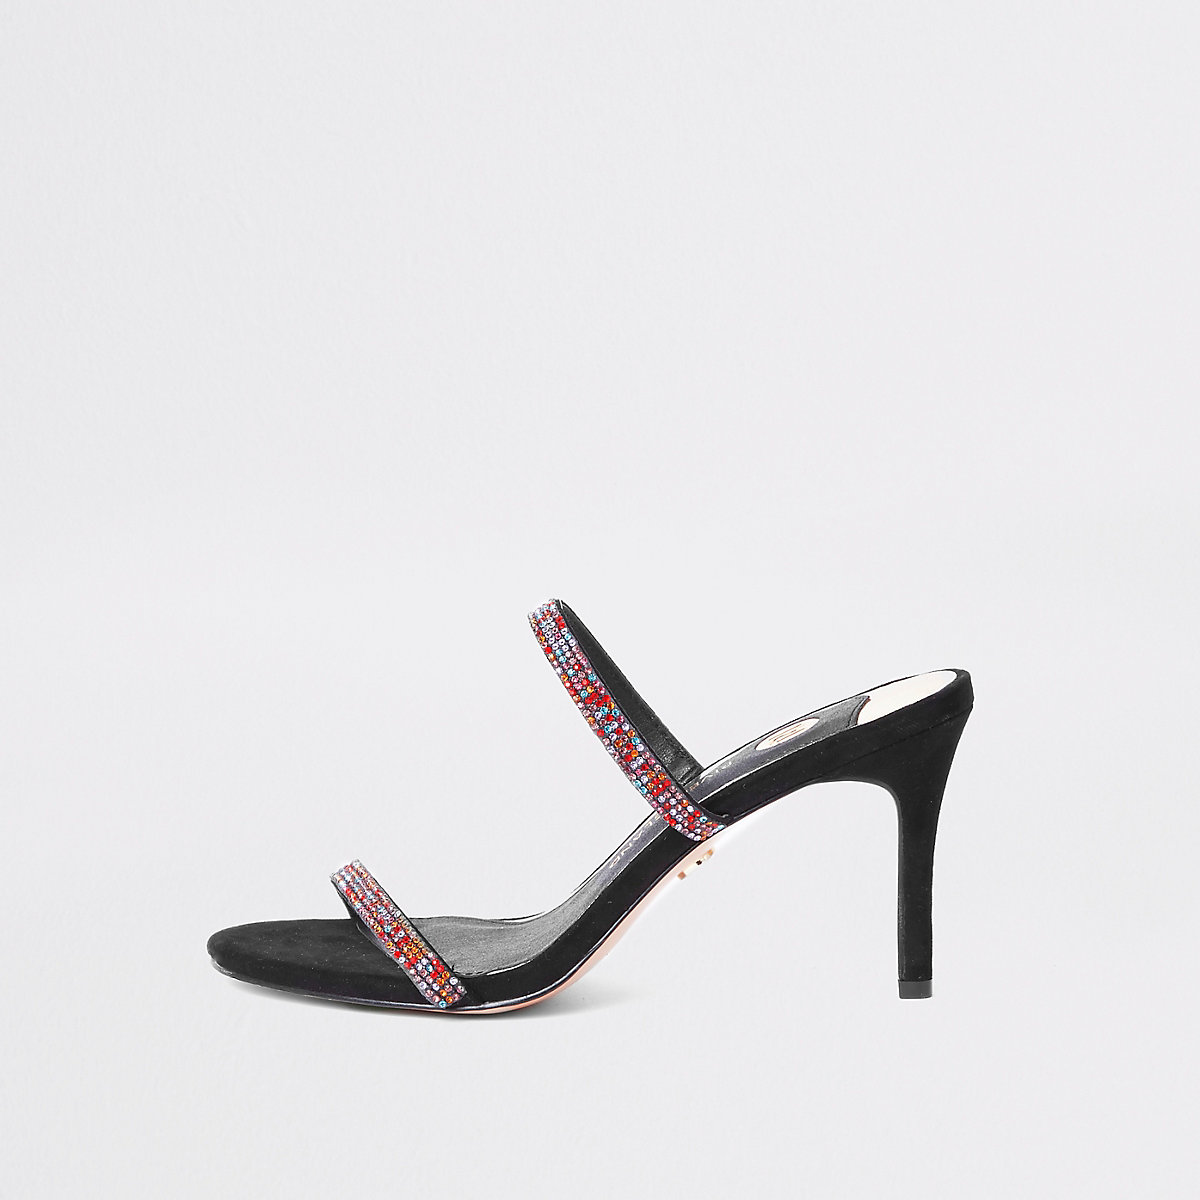 Zwarte minimalistische slip-on muiltjes met stilettohak